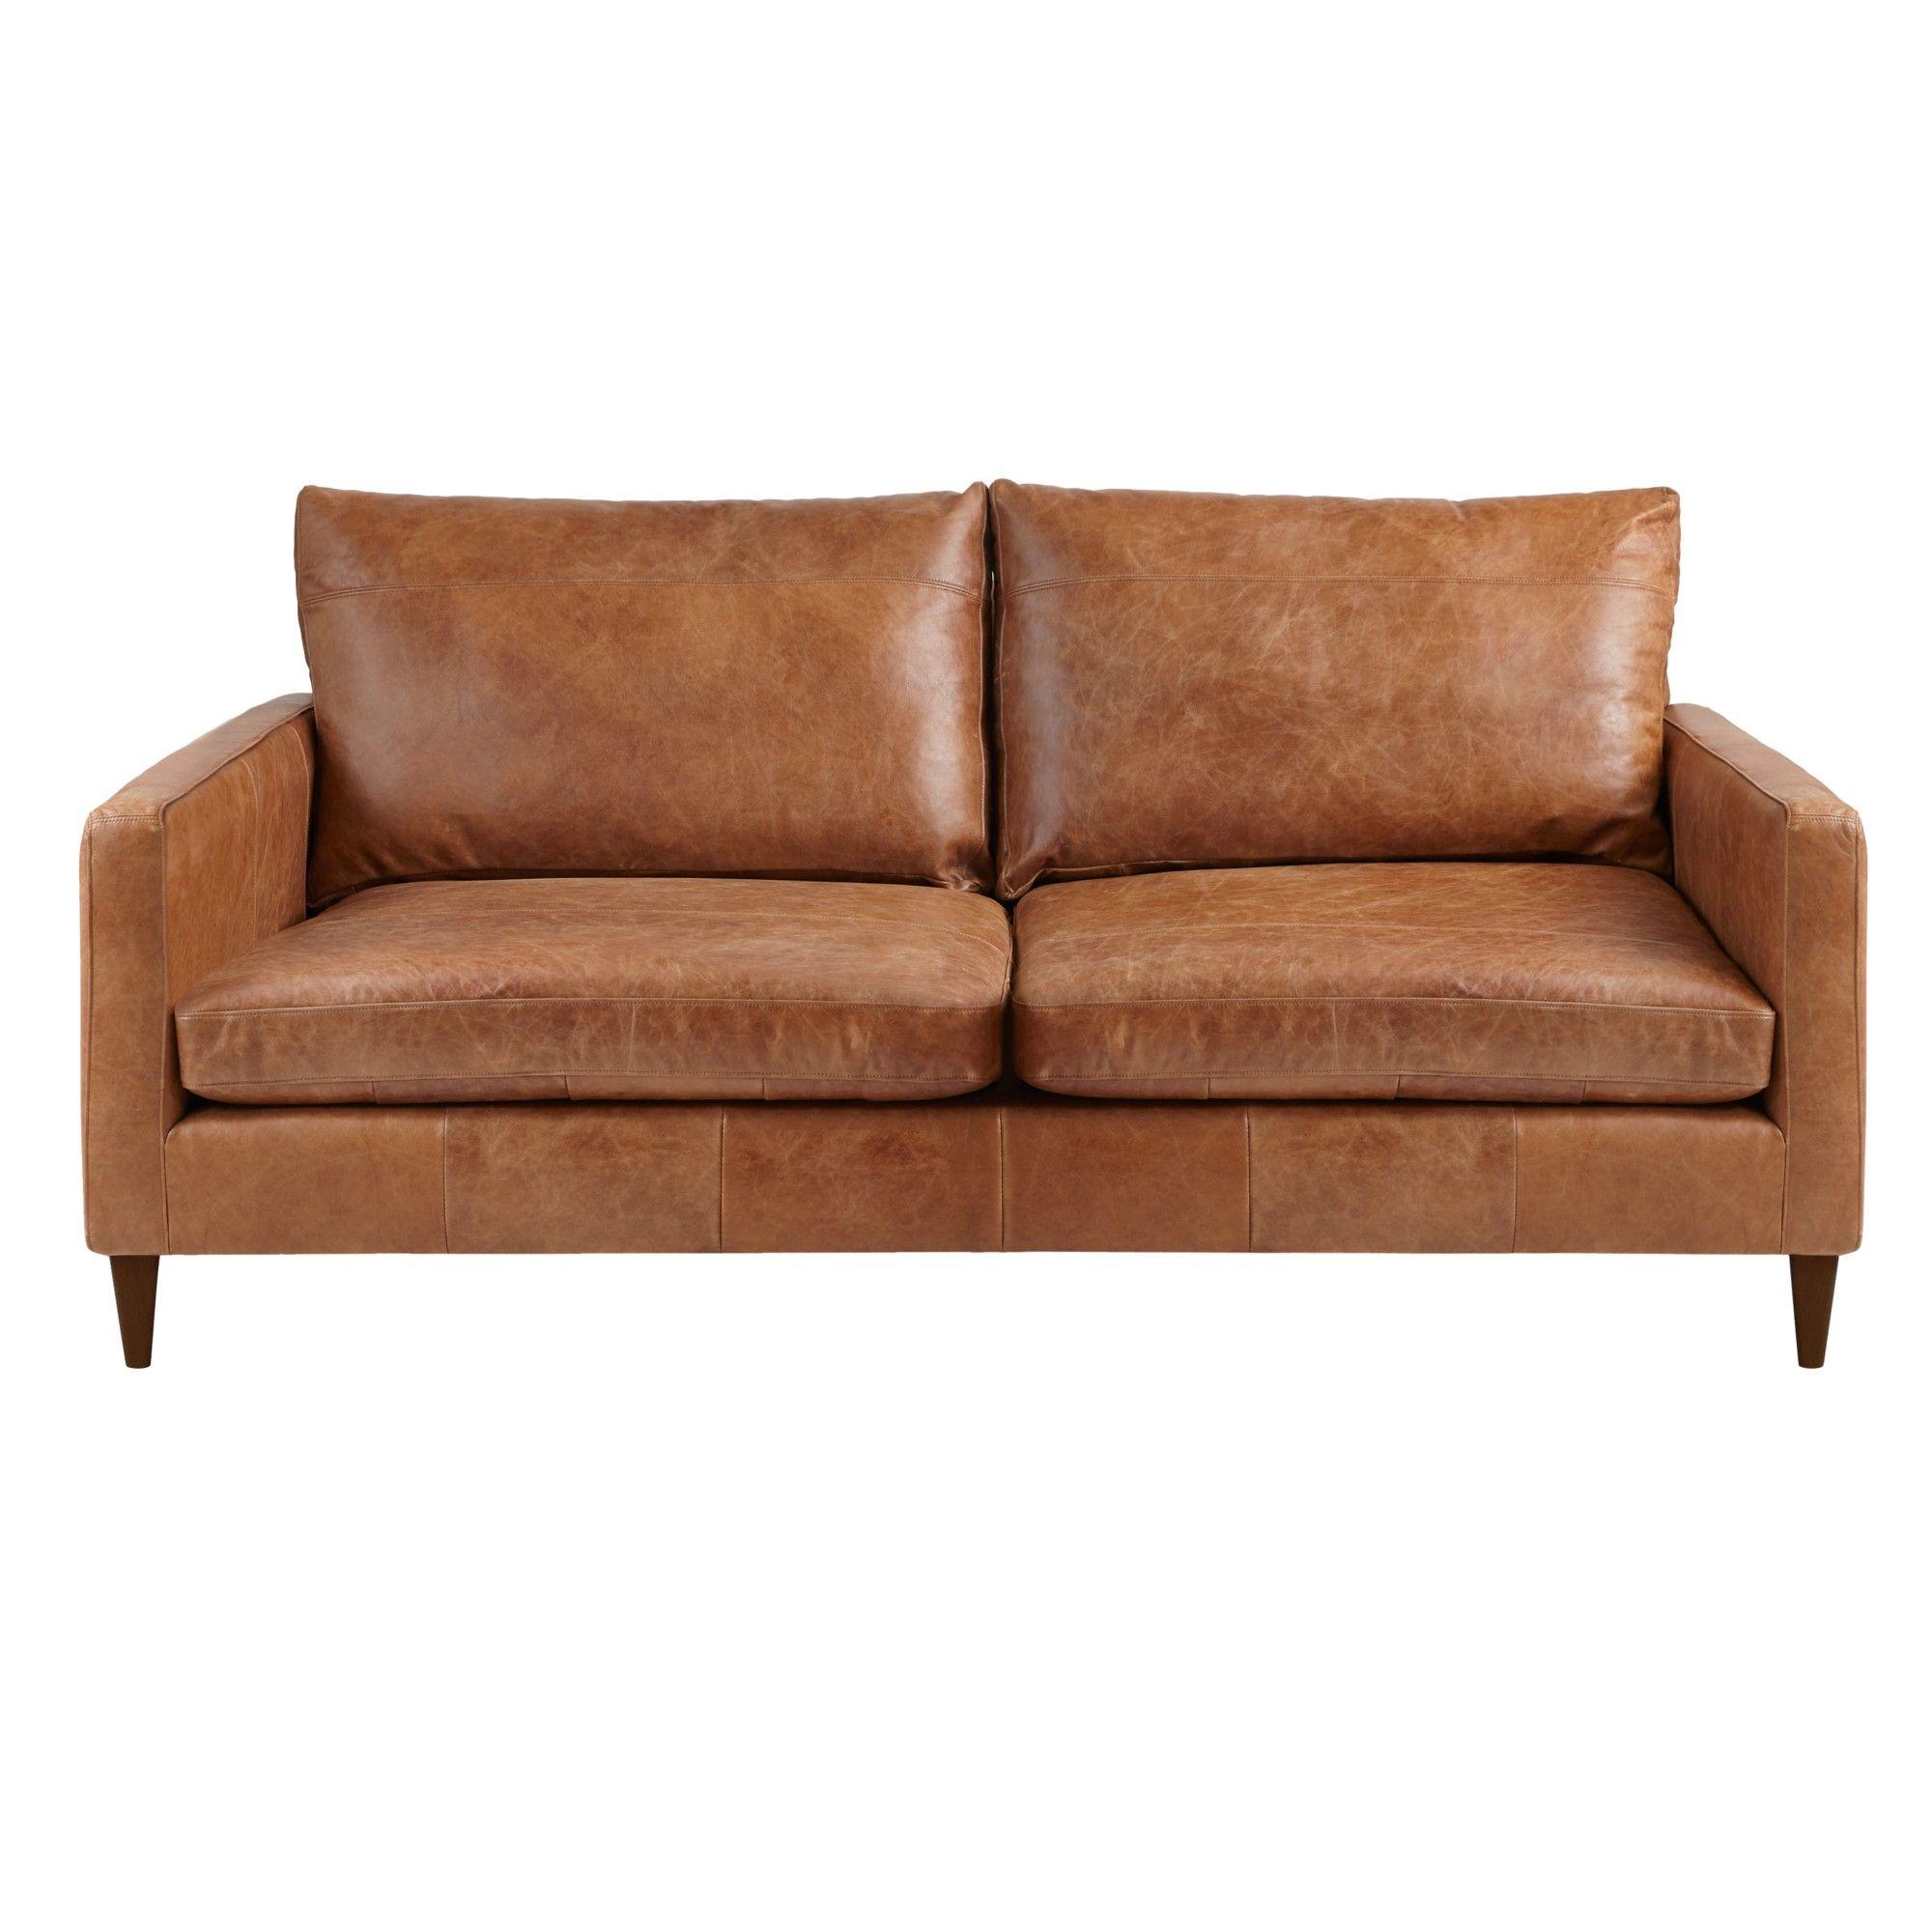 John Lewis Bailey Medium 2 Seater Leather Sofa Er Cuccino